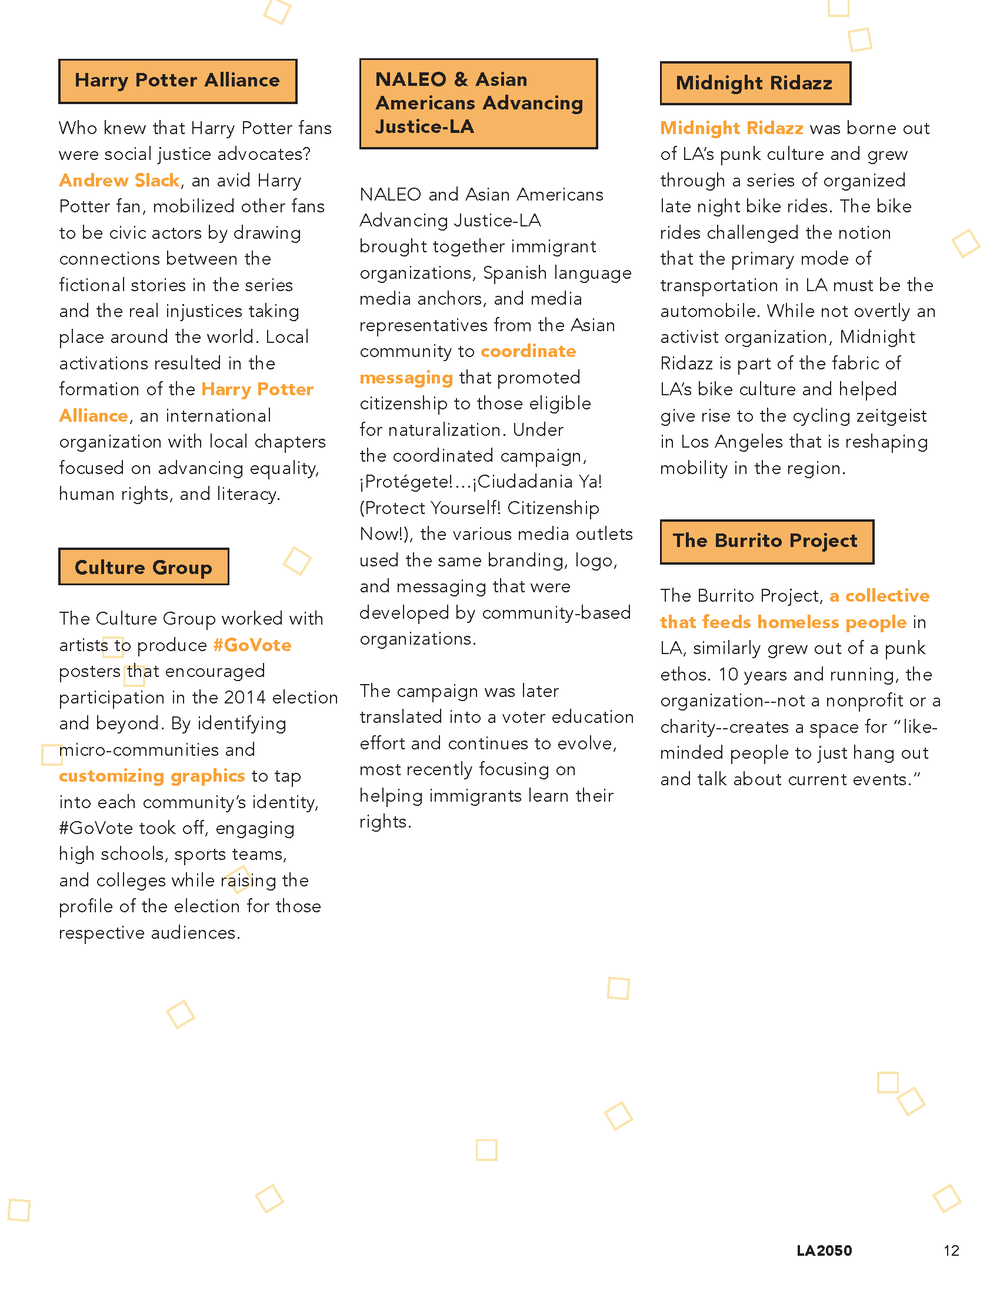 Braintrust_final_oct9_Page_12.png